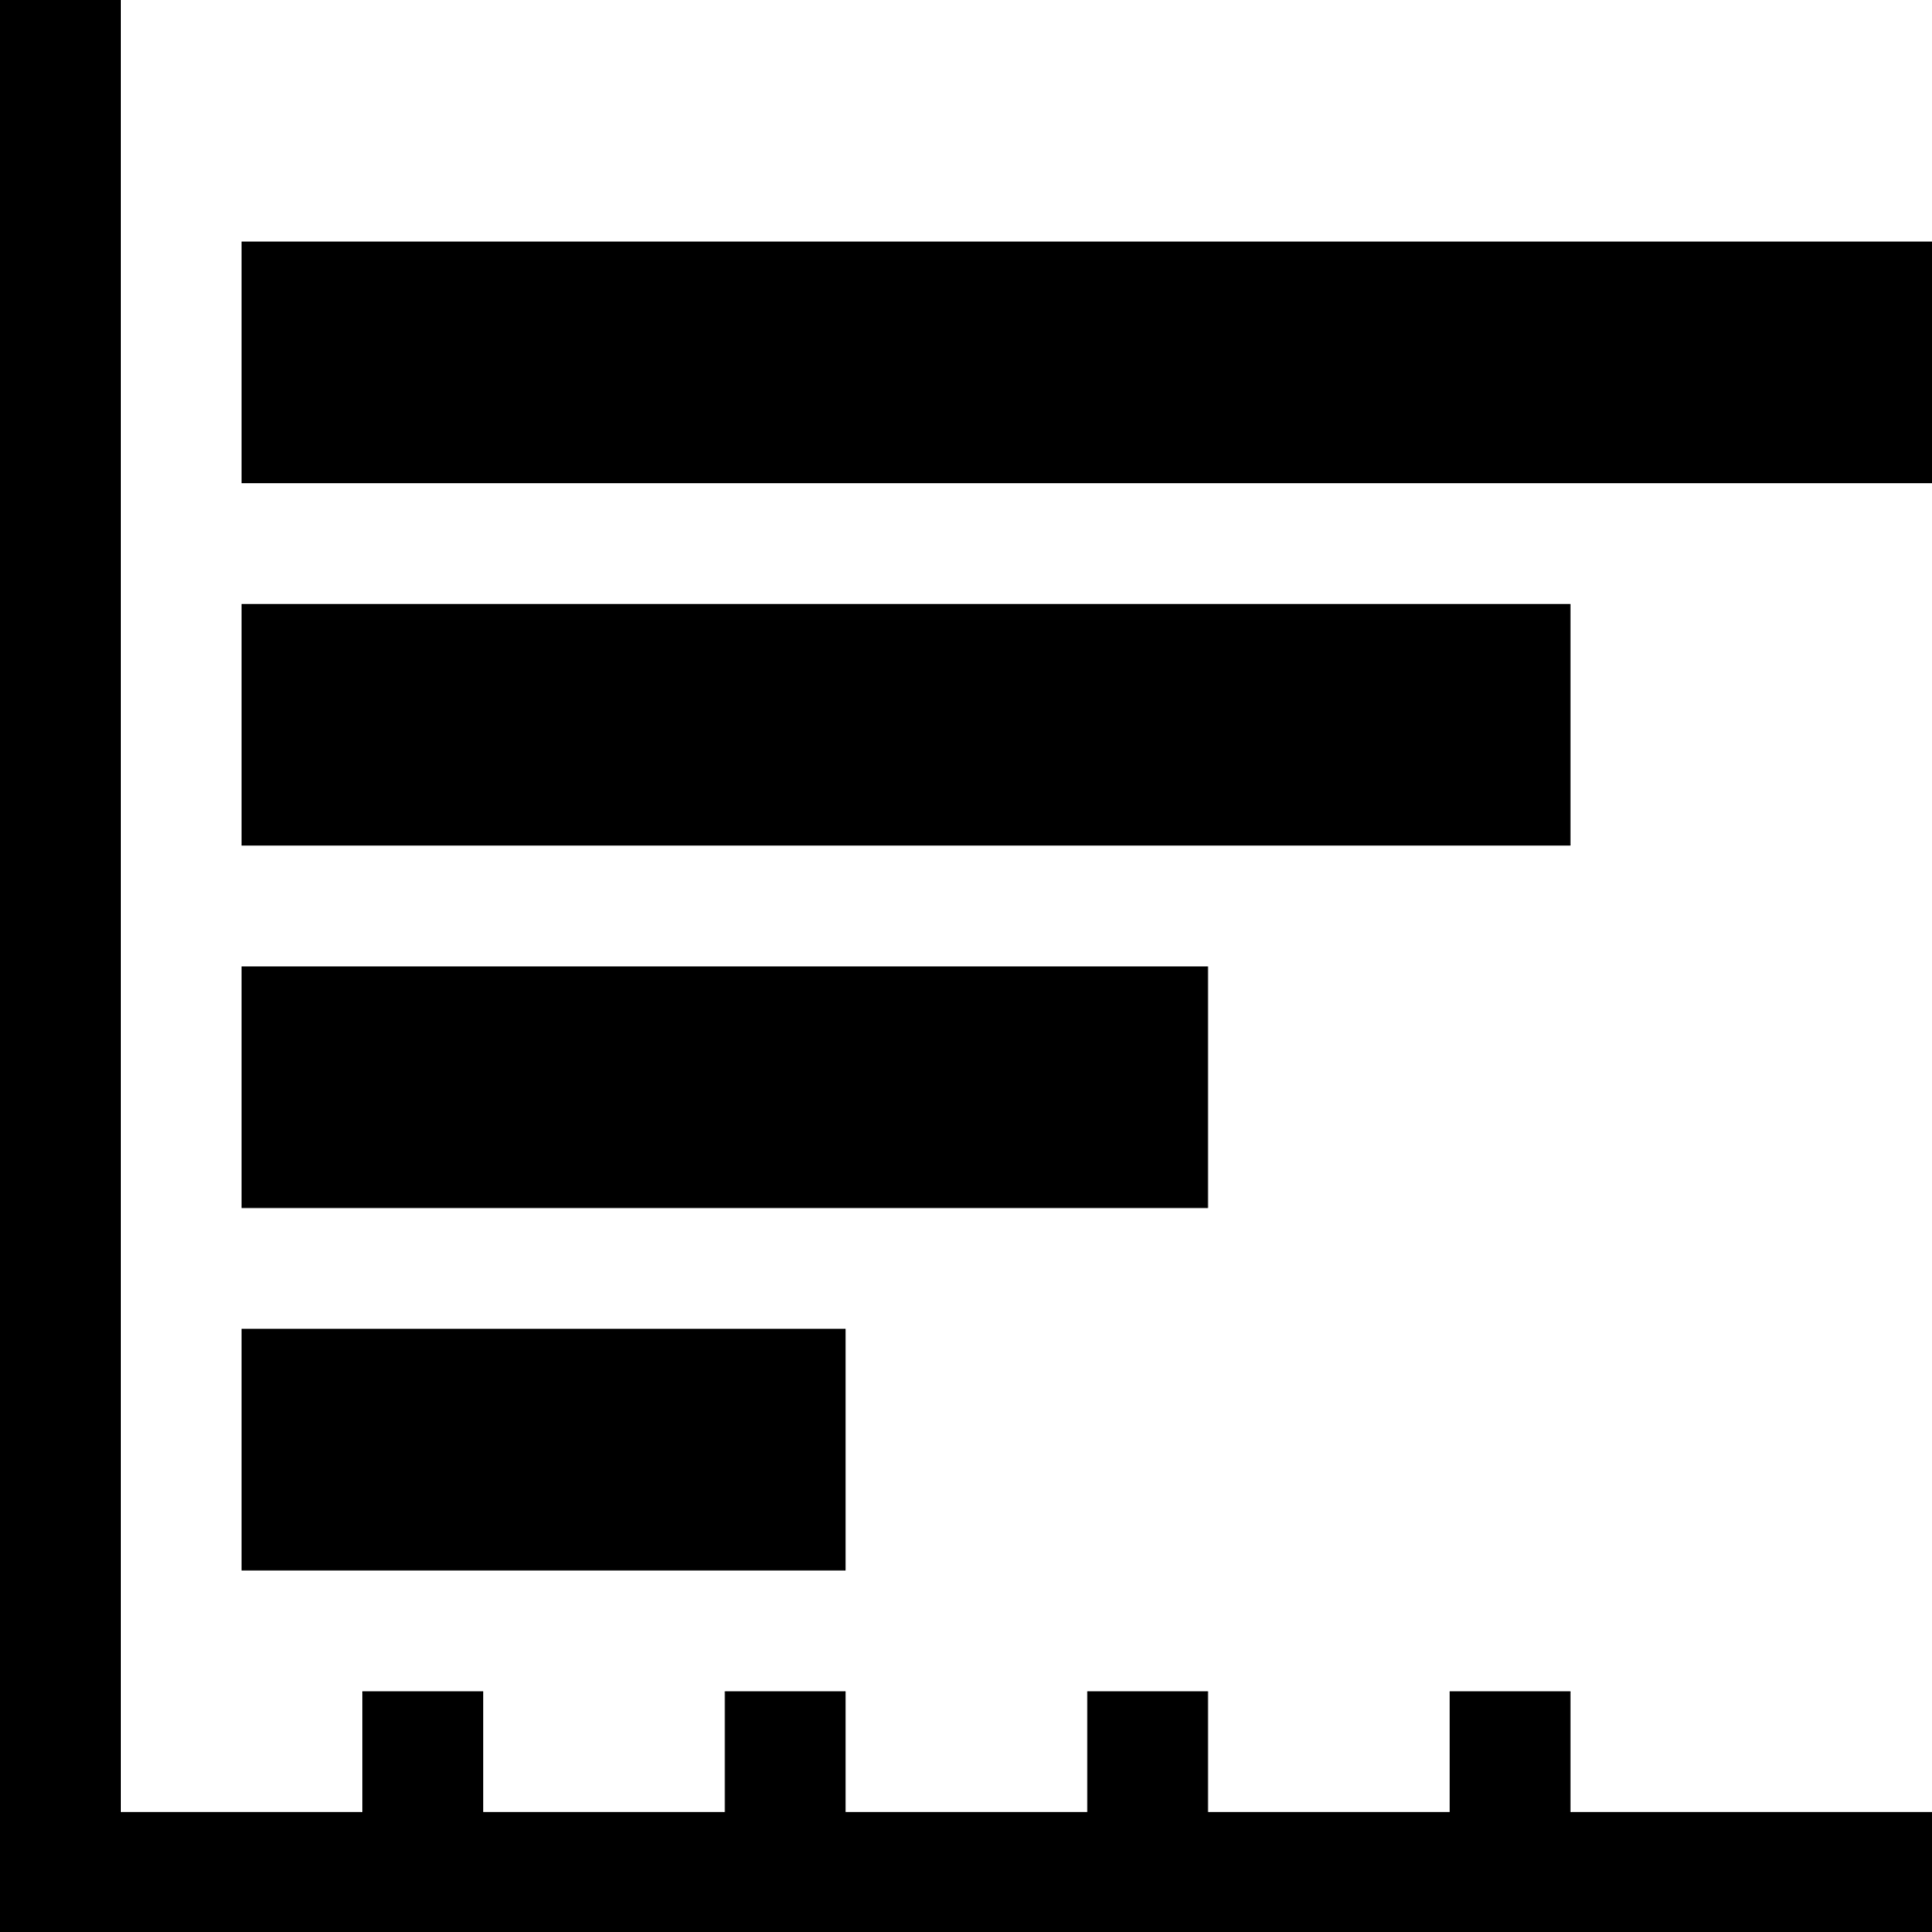 Graph clipart svg Chart File:Simpleicons bars horizontal